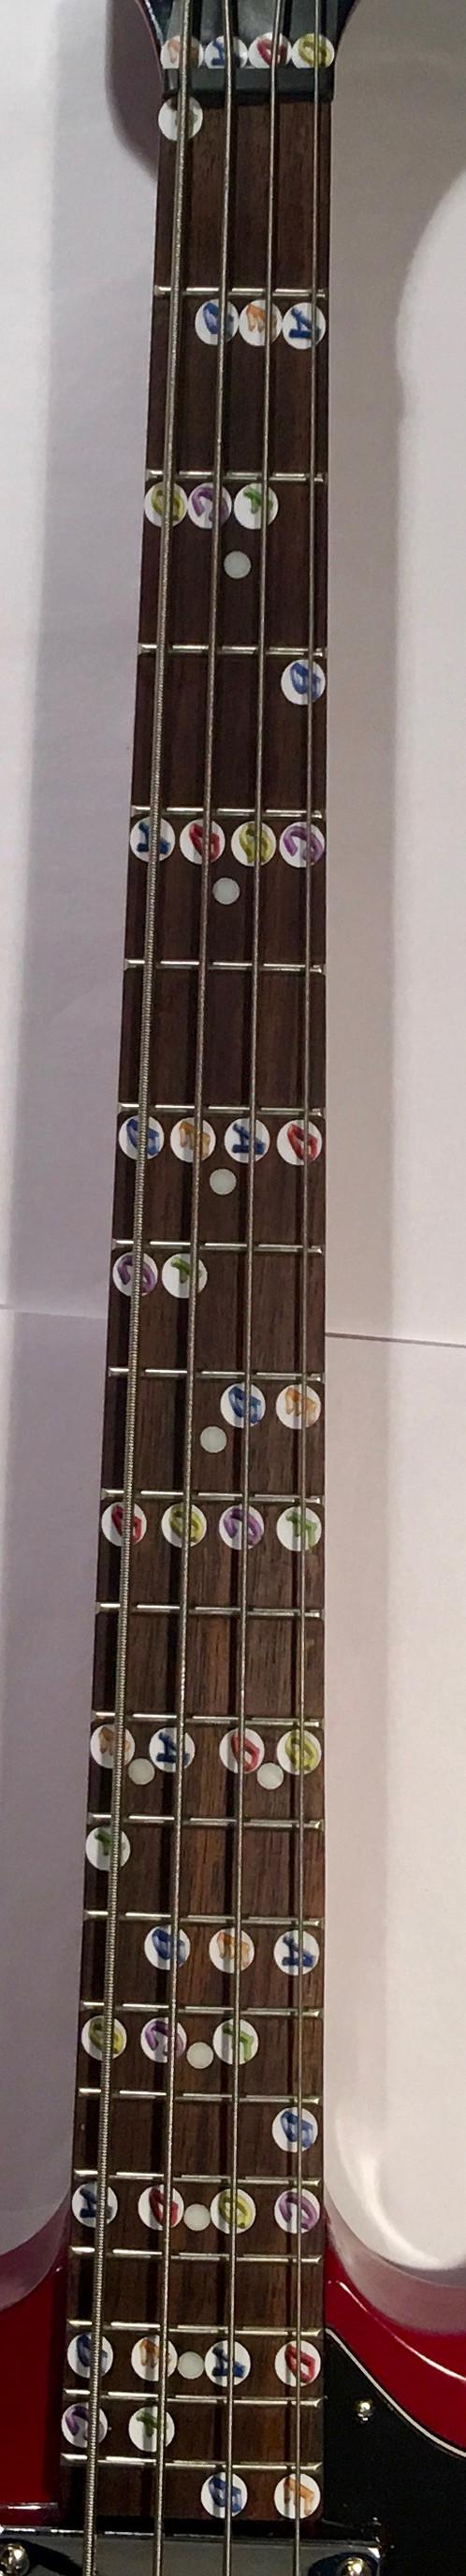 Instructional Fretboard Stickers For Bass Guitar Chalkboard